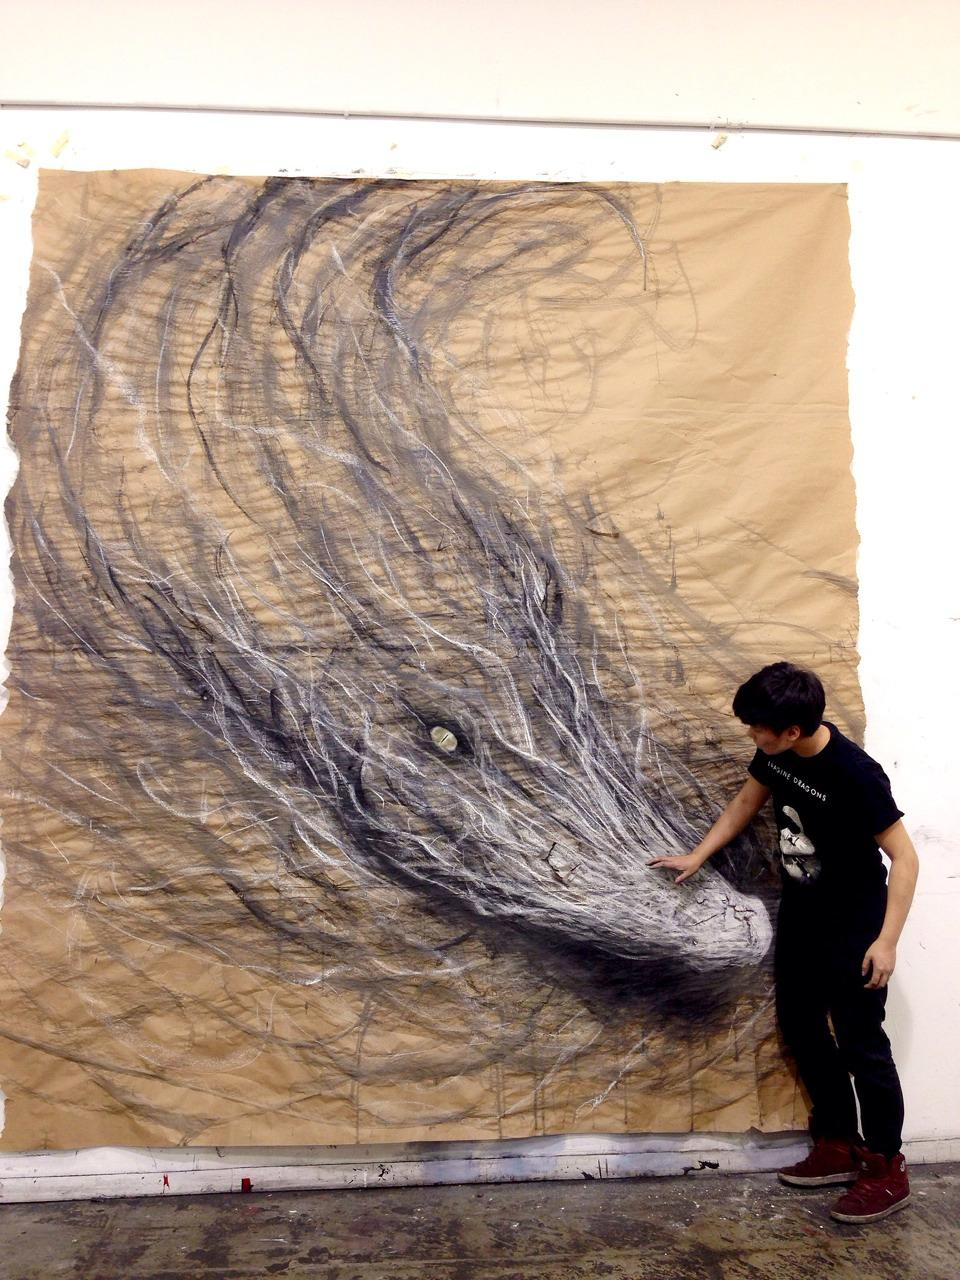 Salt water crocodile. (2014) by Fiona Tang